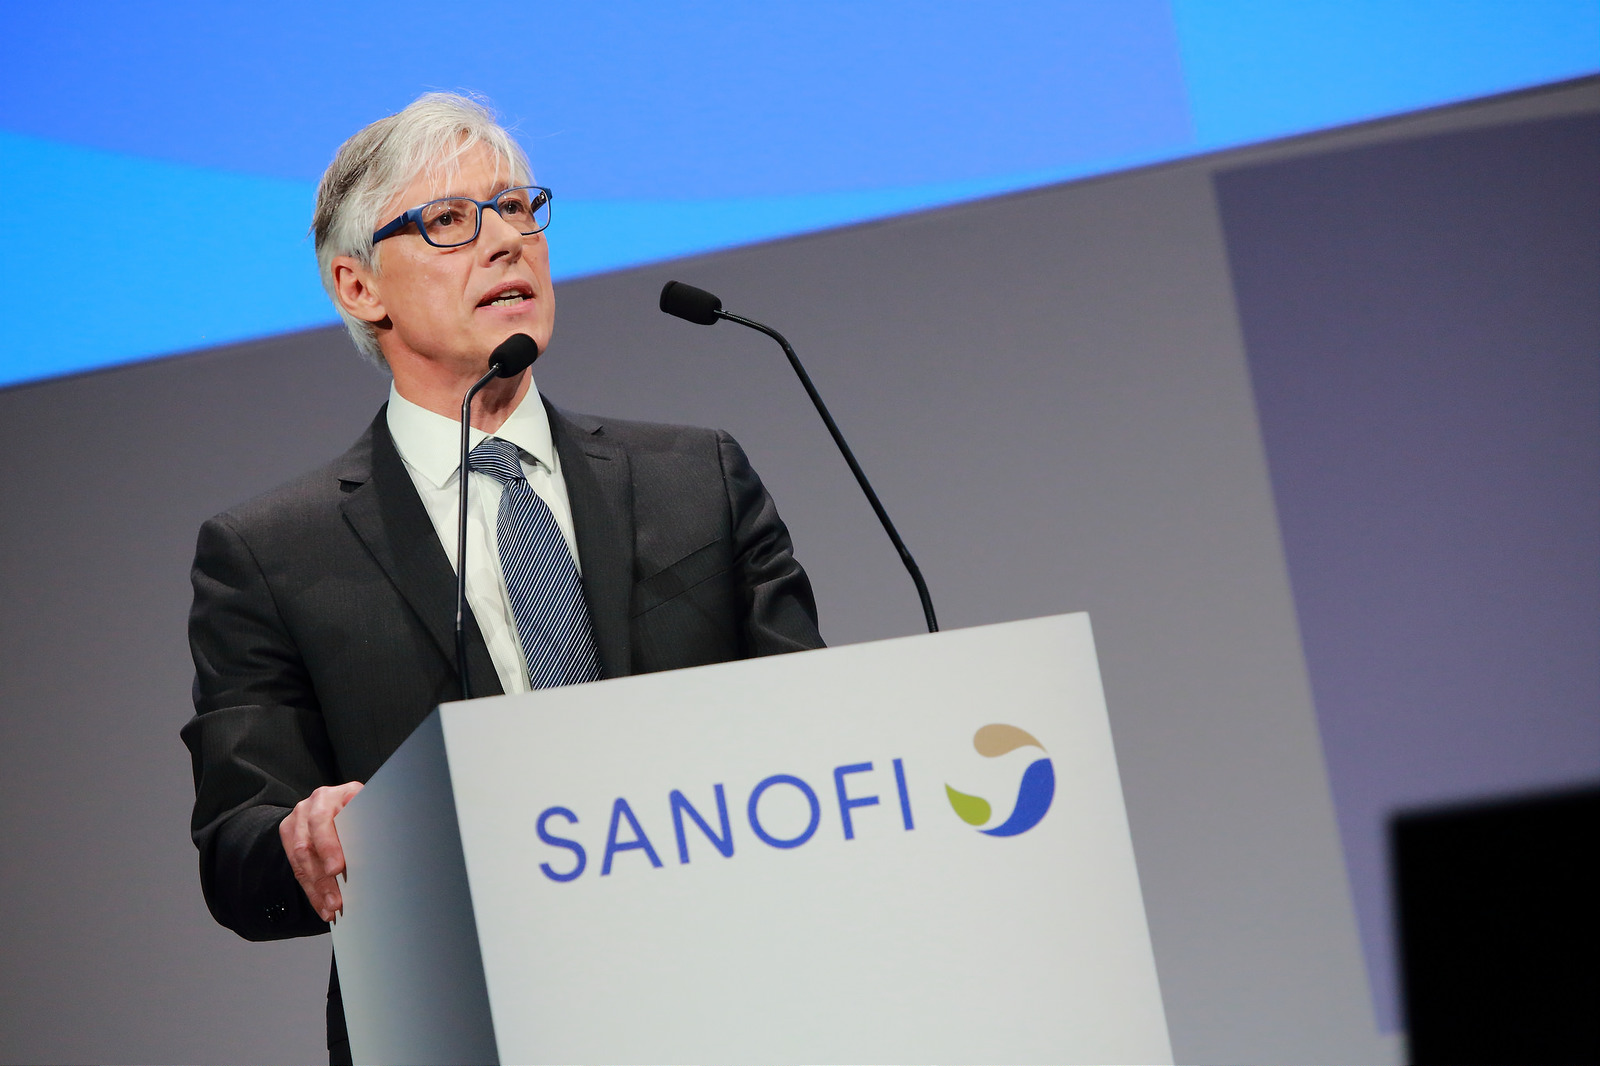 Sanofi CEO speech